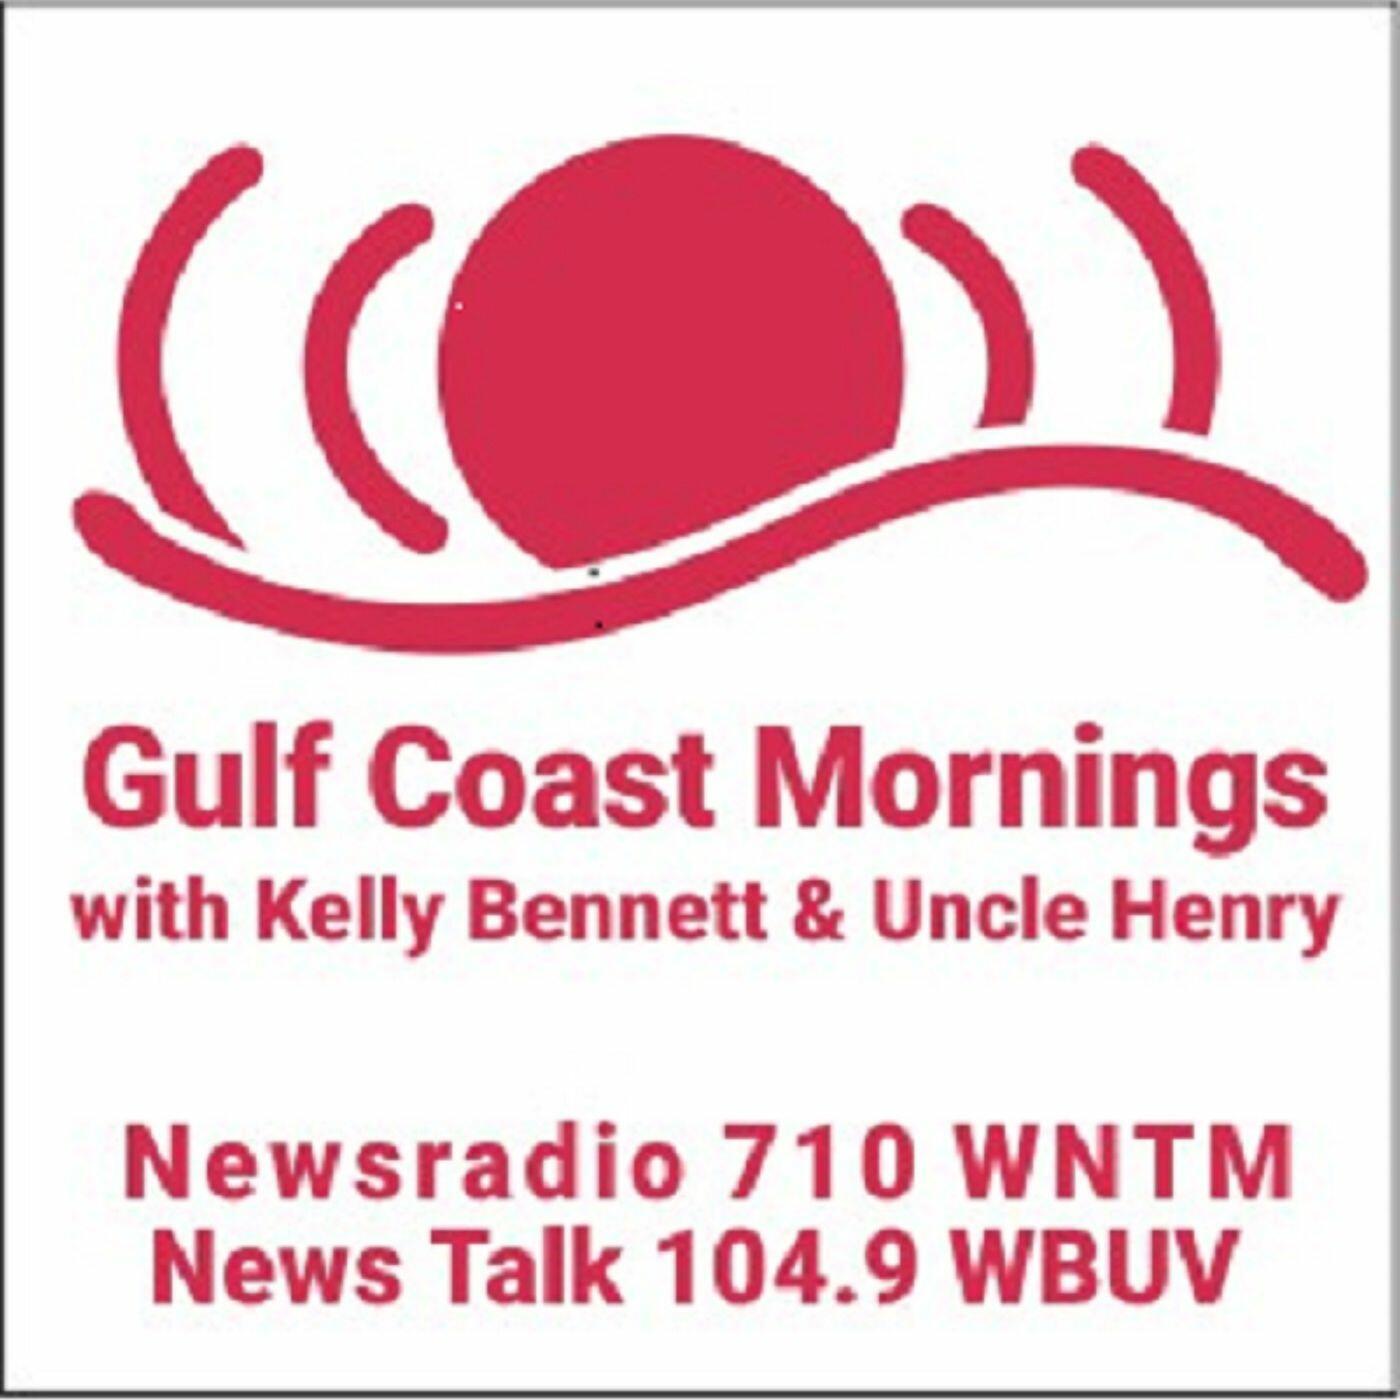 Gulf Coast Mornings